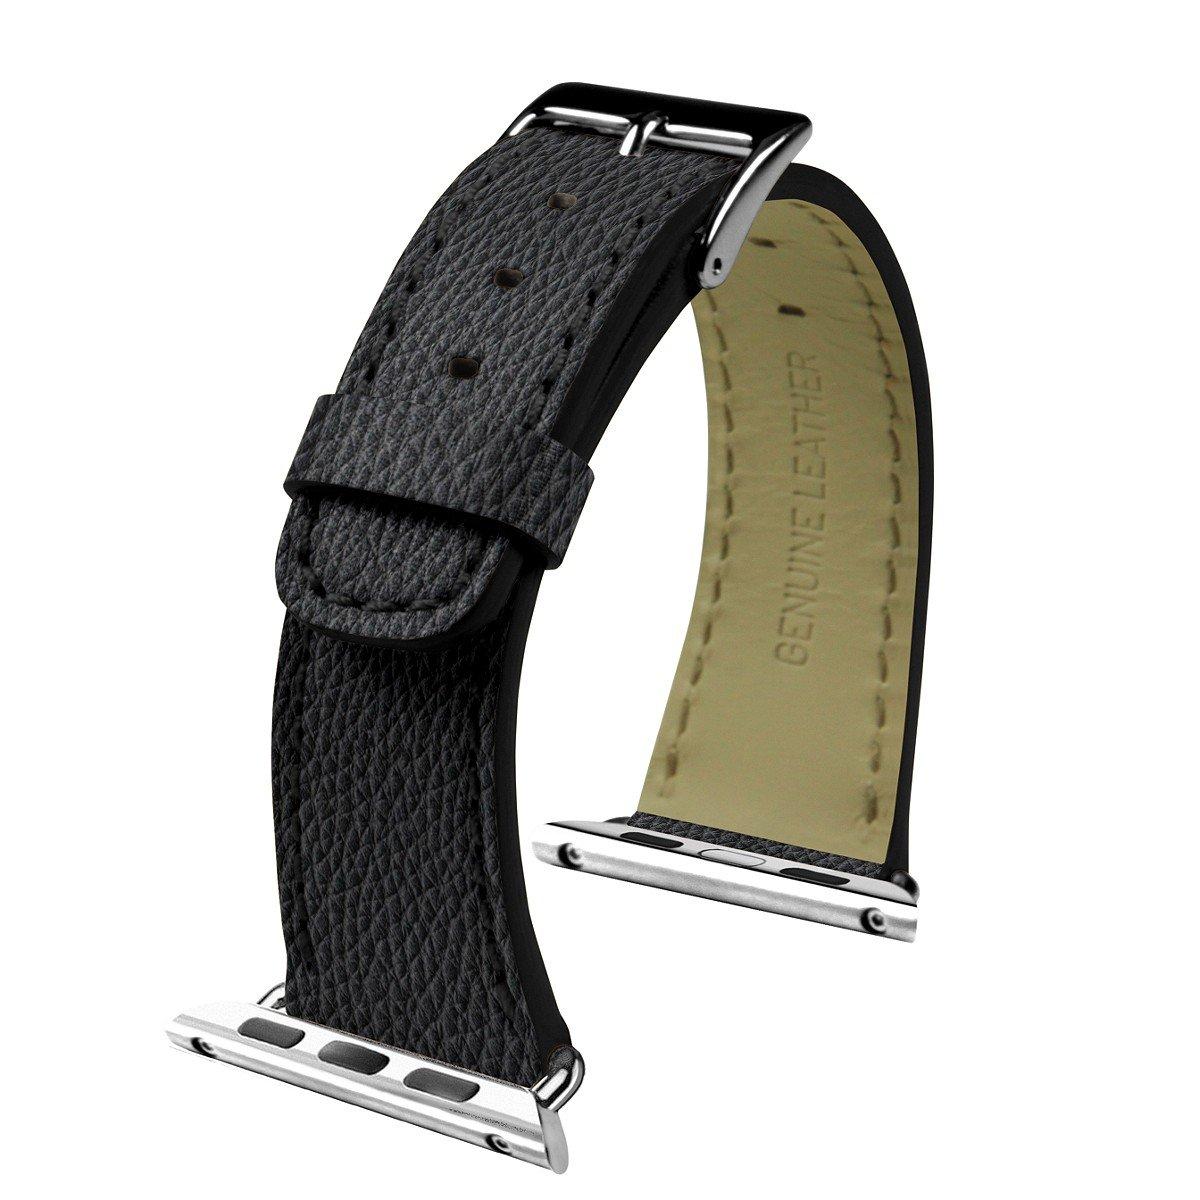 Lucrin - Apple Watch armband 42 mm - Klassisch - Schwarz - Leder genarbt